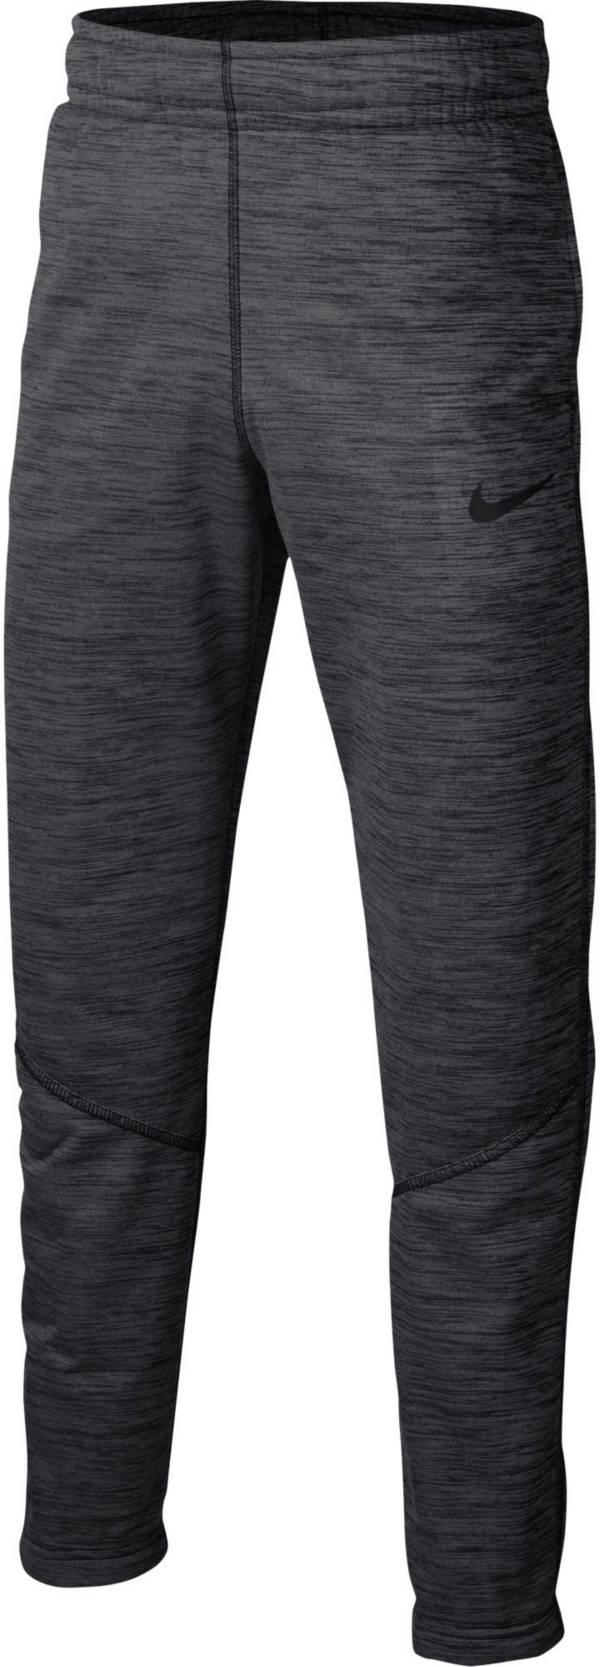 Nike Boys' Therma Training Pants product image